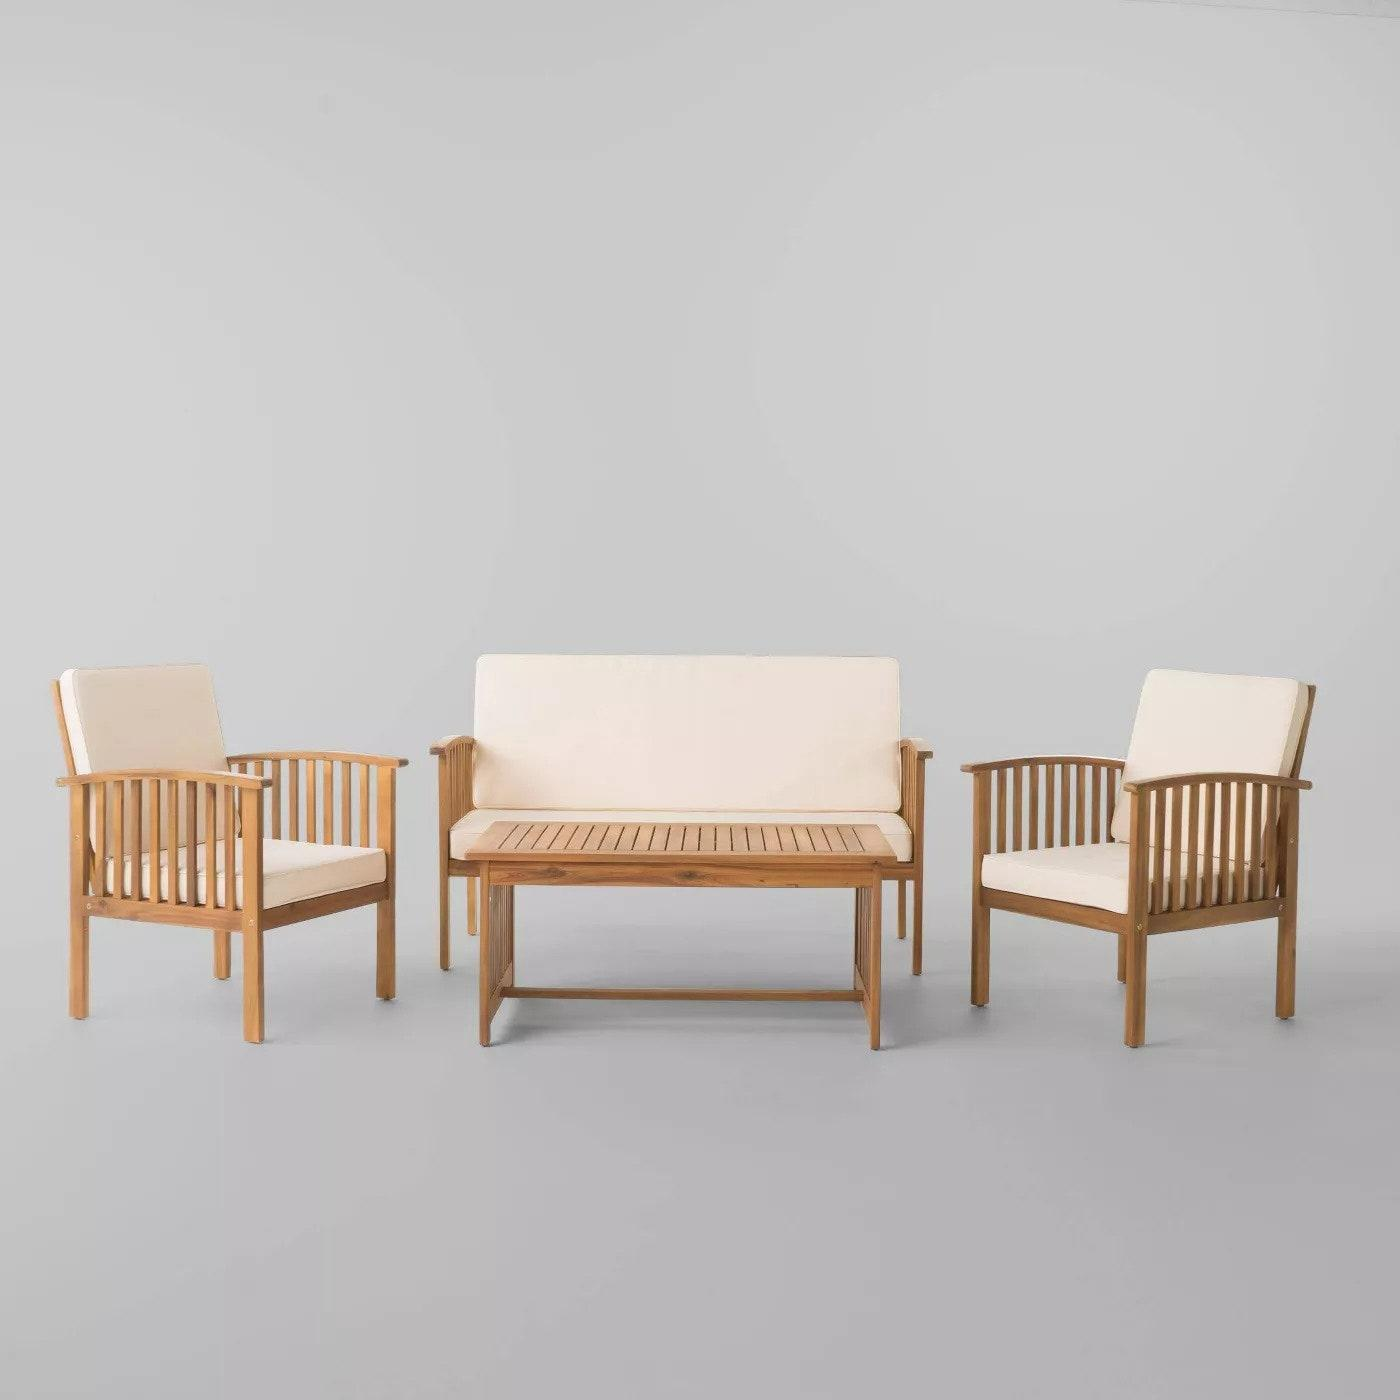 12 Outdoor Furniture Sets for Living Alfresco